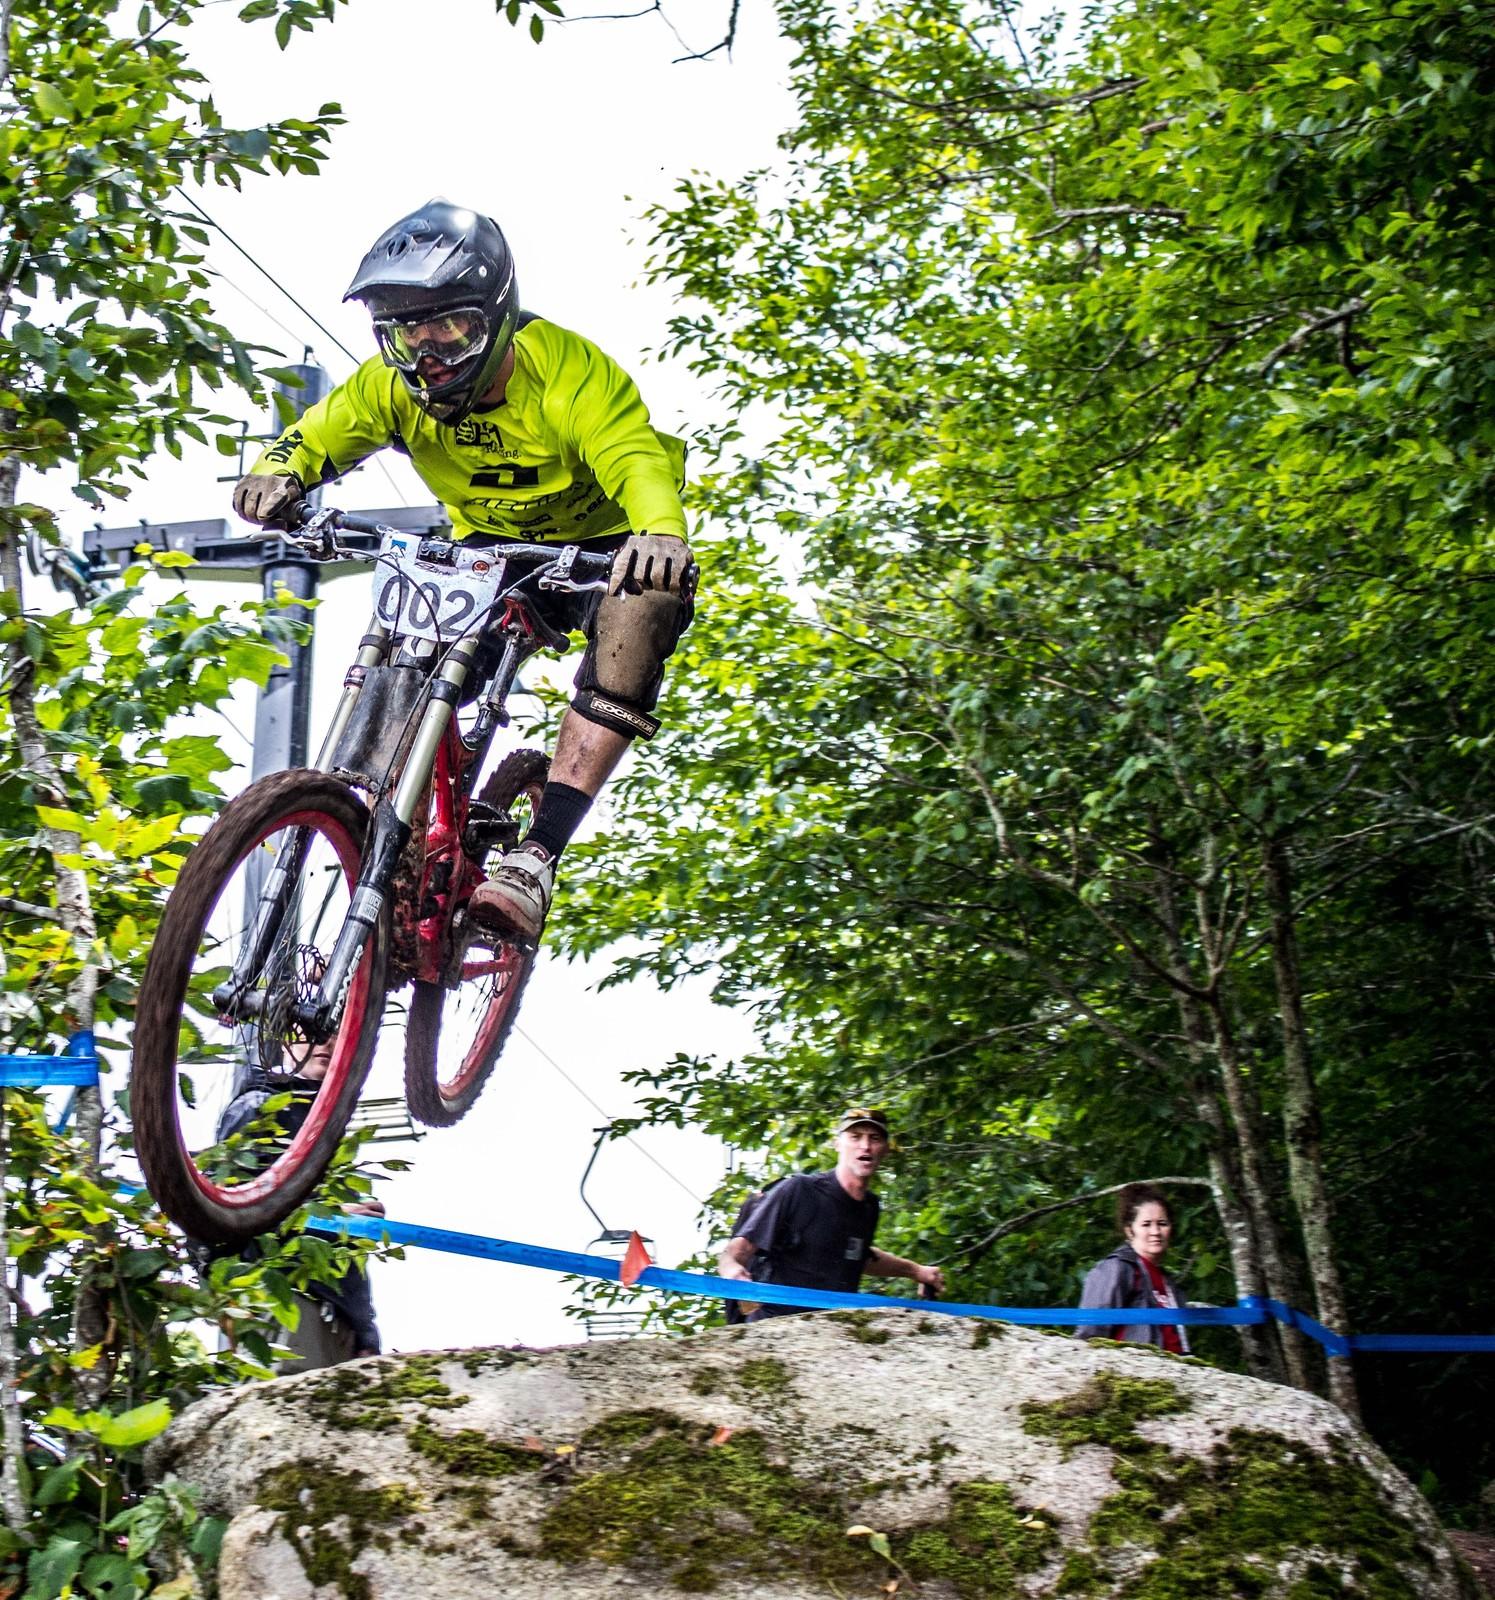 IMG 4037 - mtndrew - Mountain Biking Pictures - Vital MTB